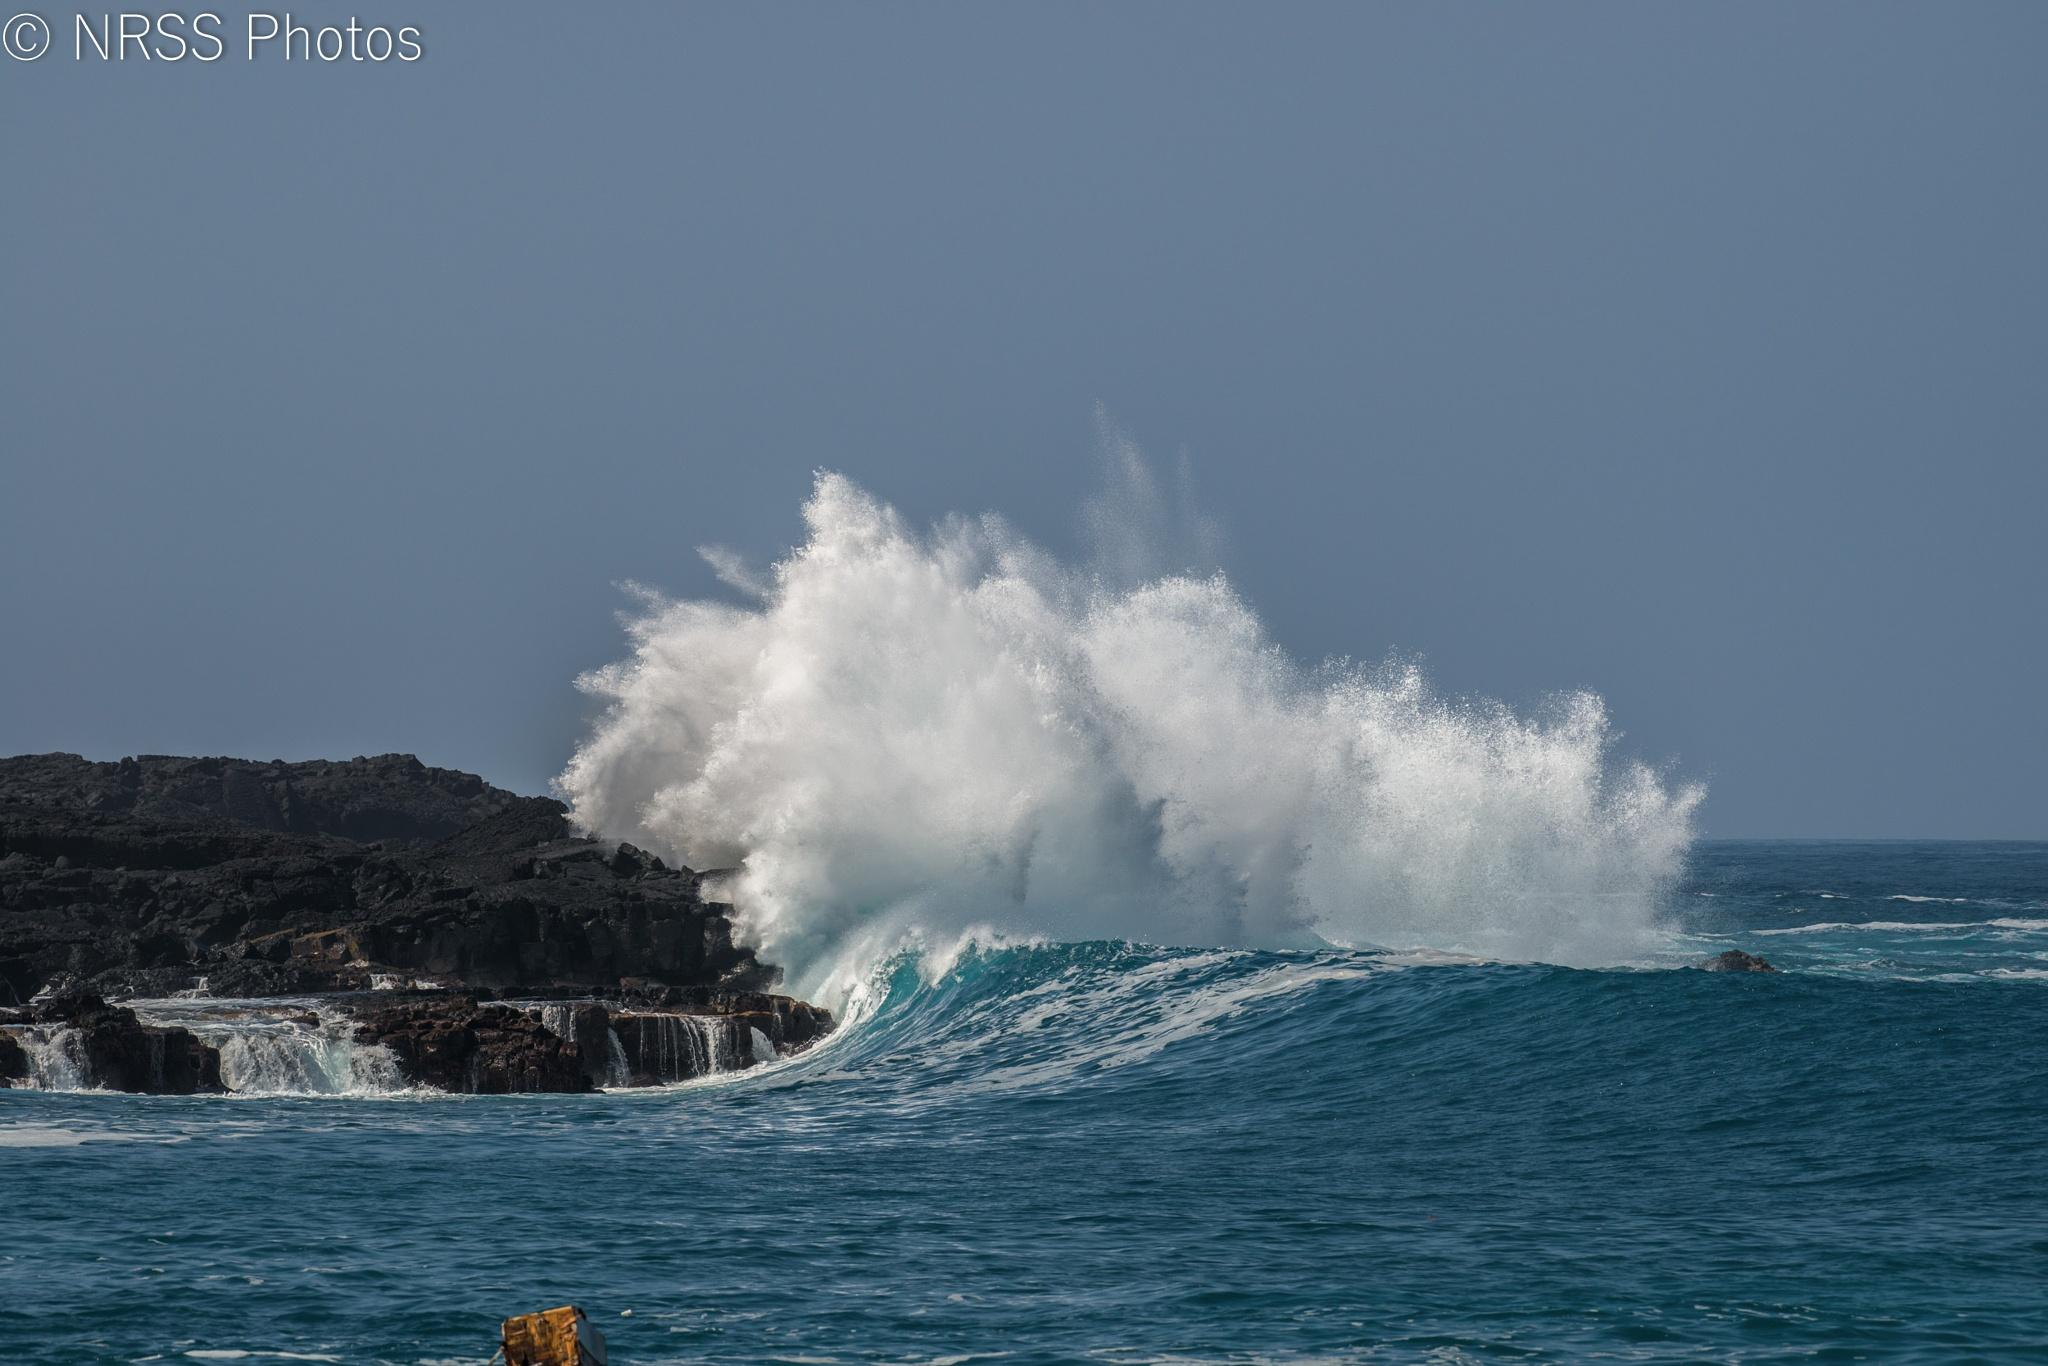 crashing wave by Chris Smith